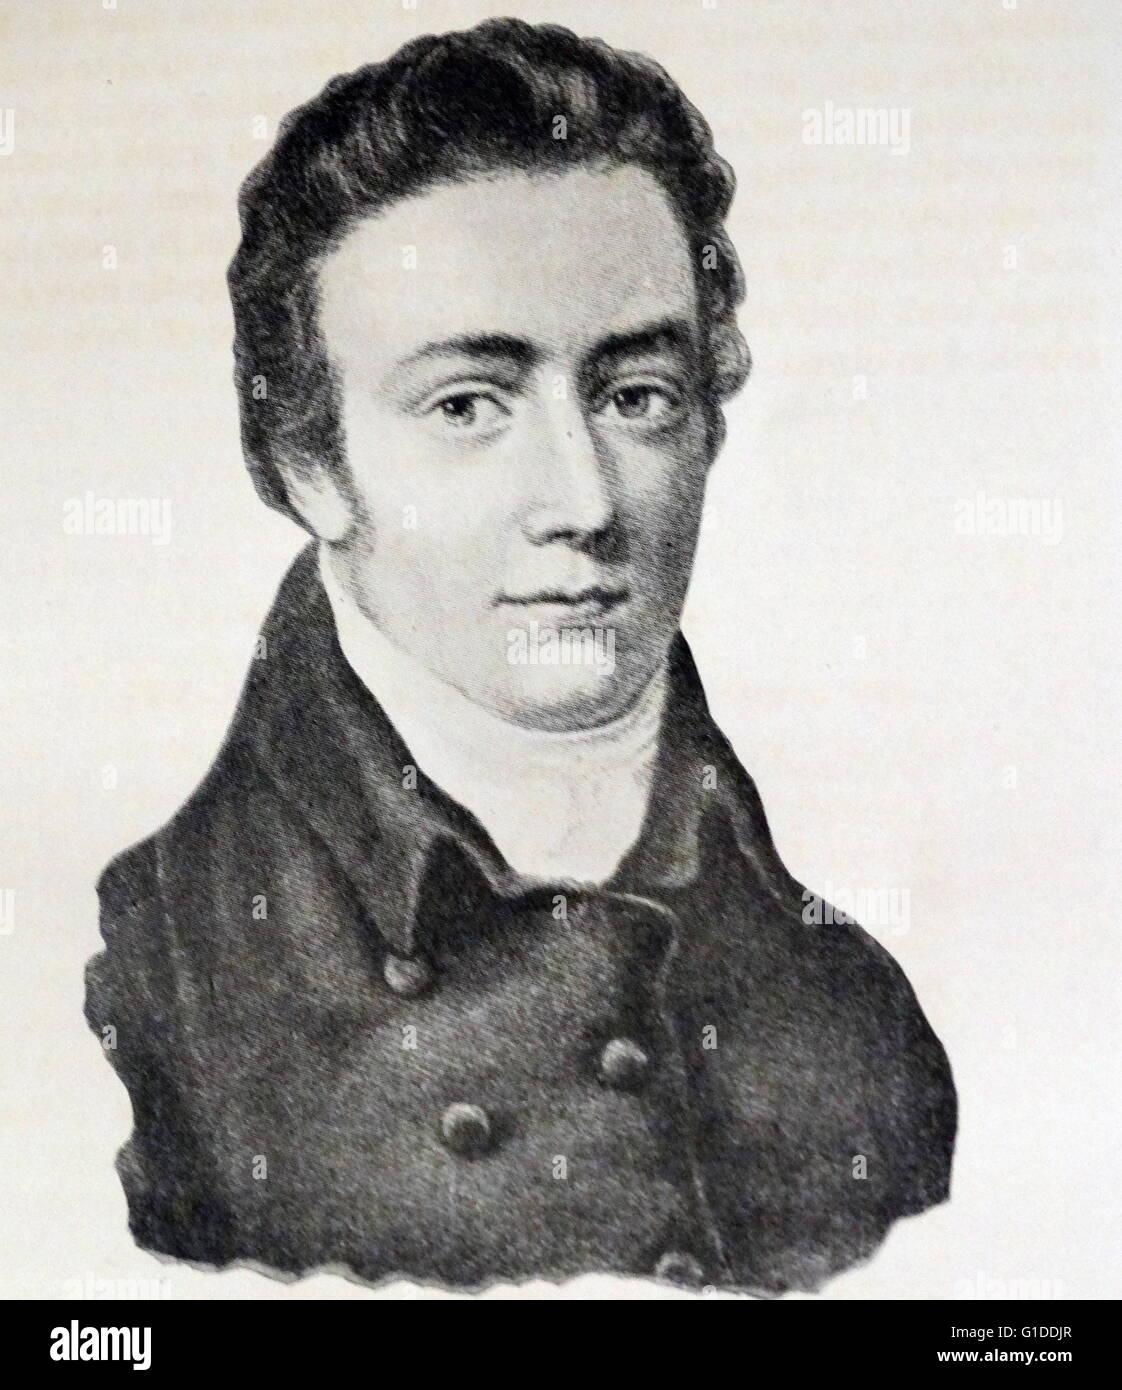 Portrait of Samuel Taylor Coleridge (1772-1834) an English poet, literary  critic